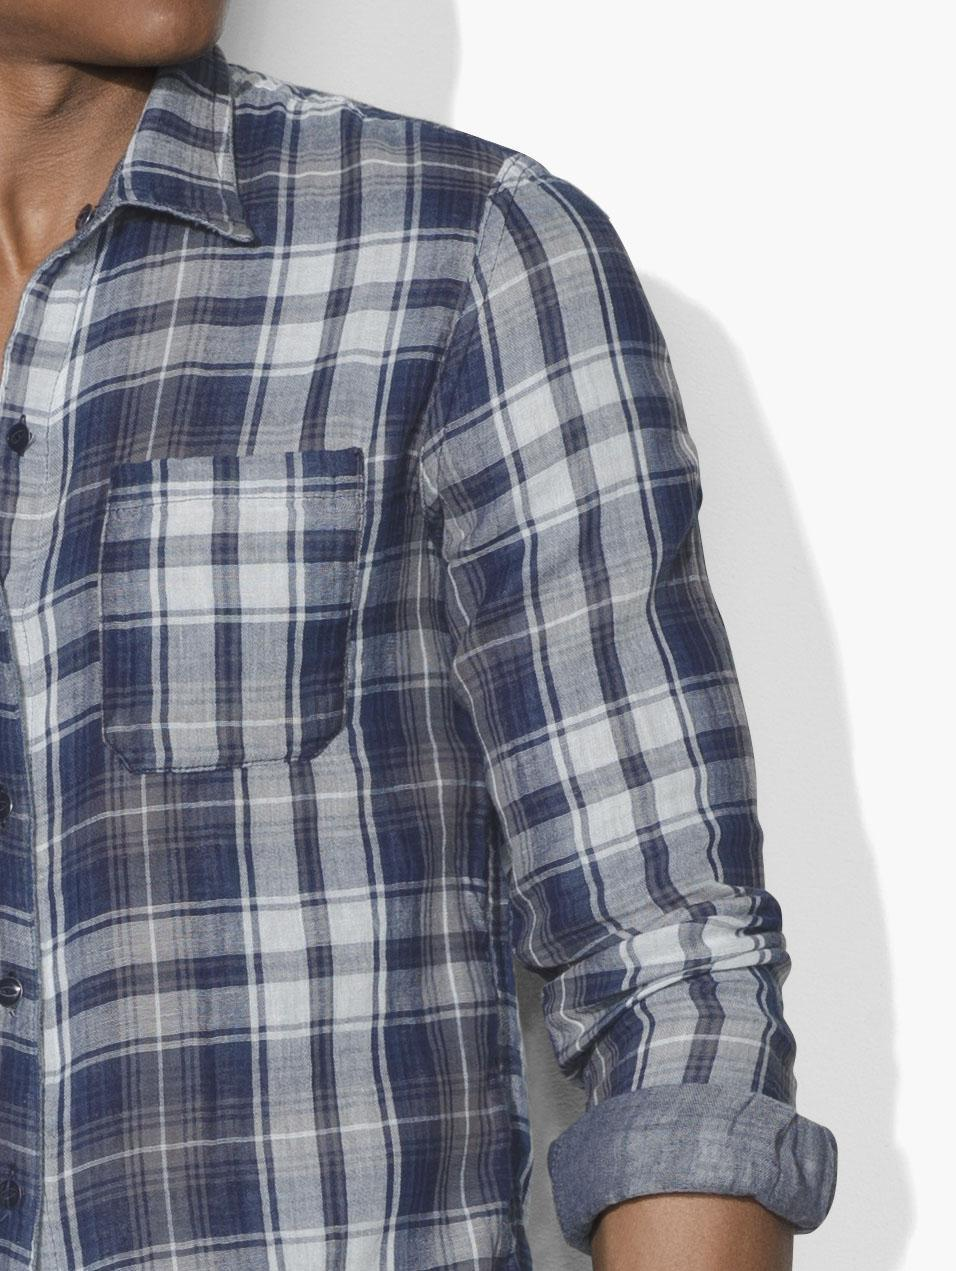 John Varvatos Cotton Reversible Plaid Shirt in Blue for Men